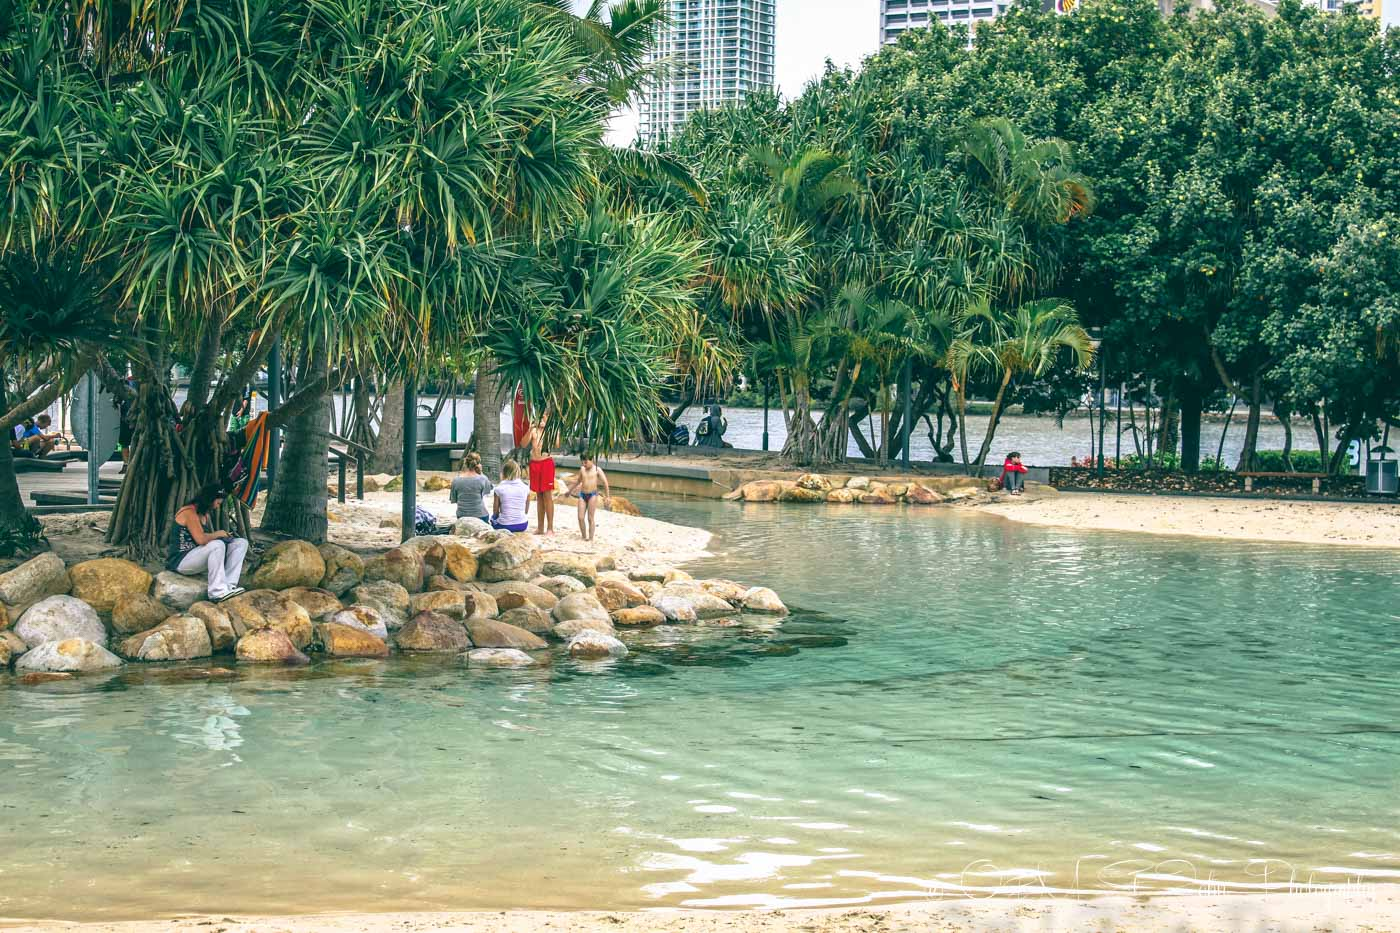 What to do in Brisbane city: Brisbane's city beach. Australia